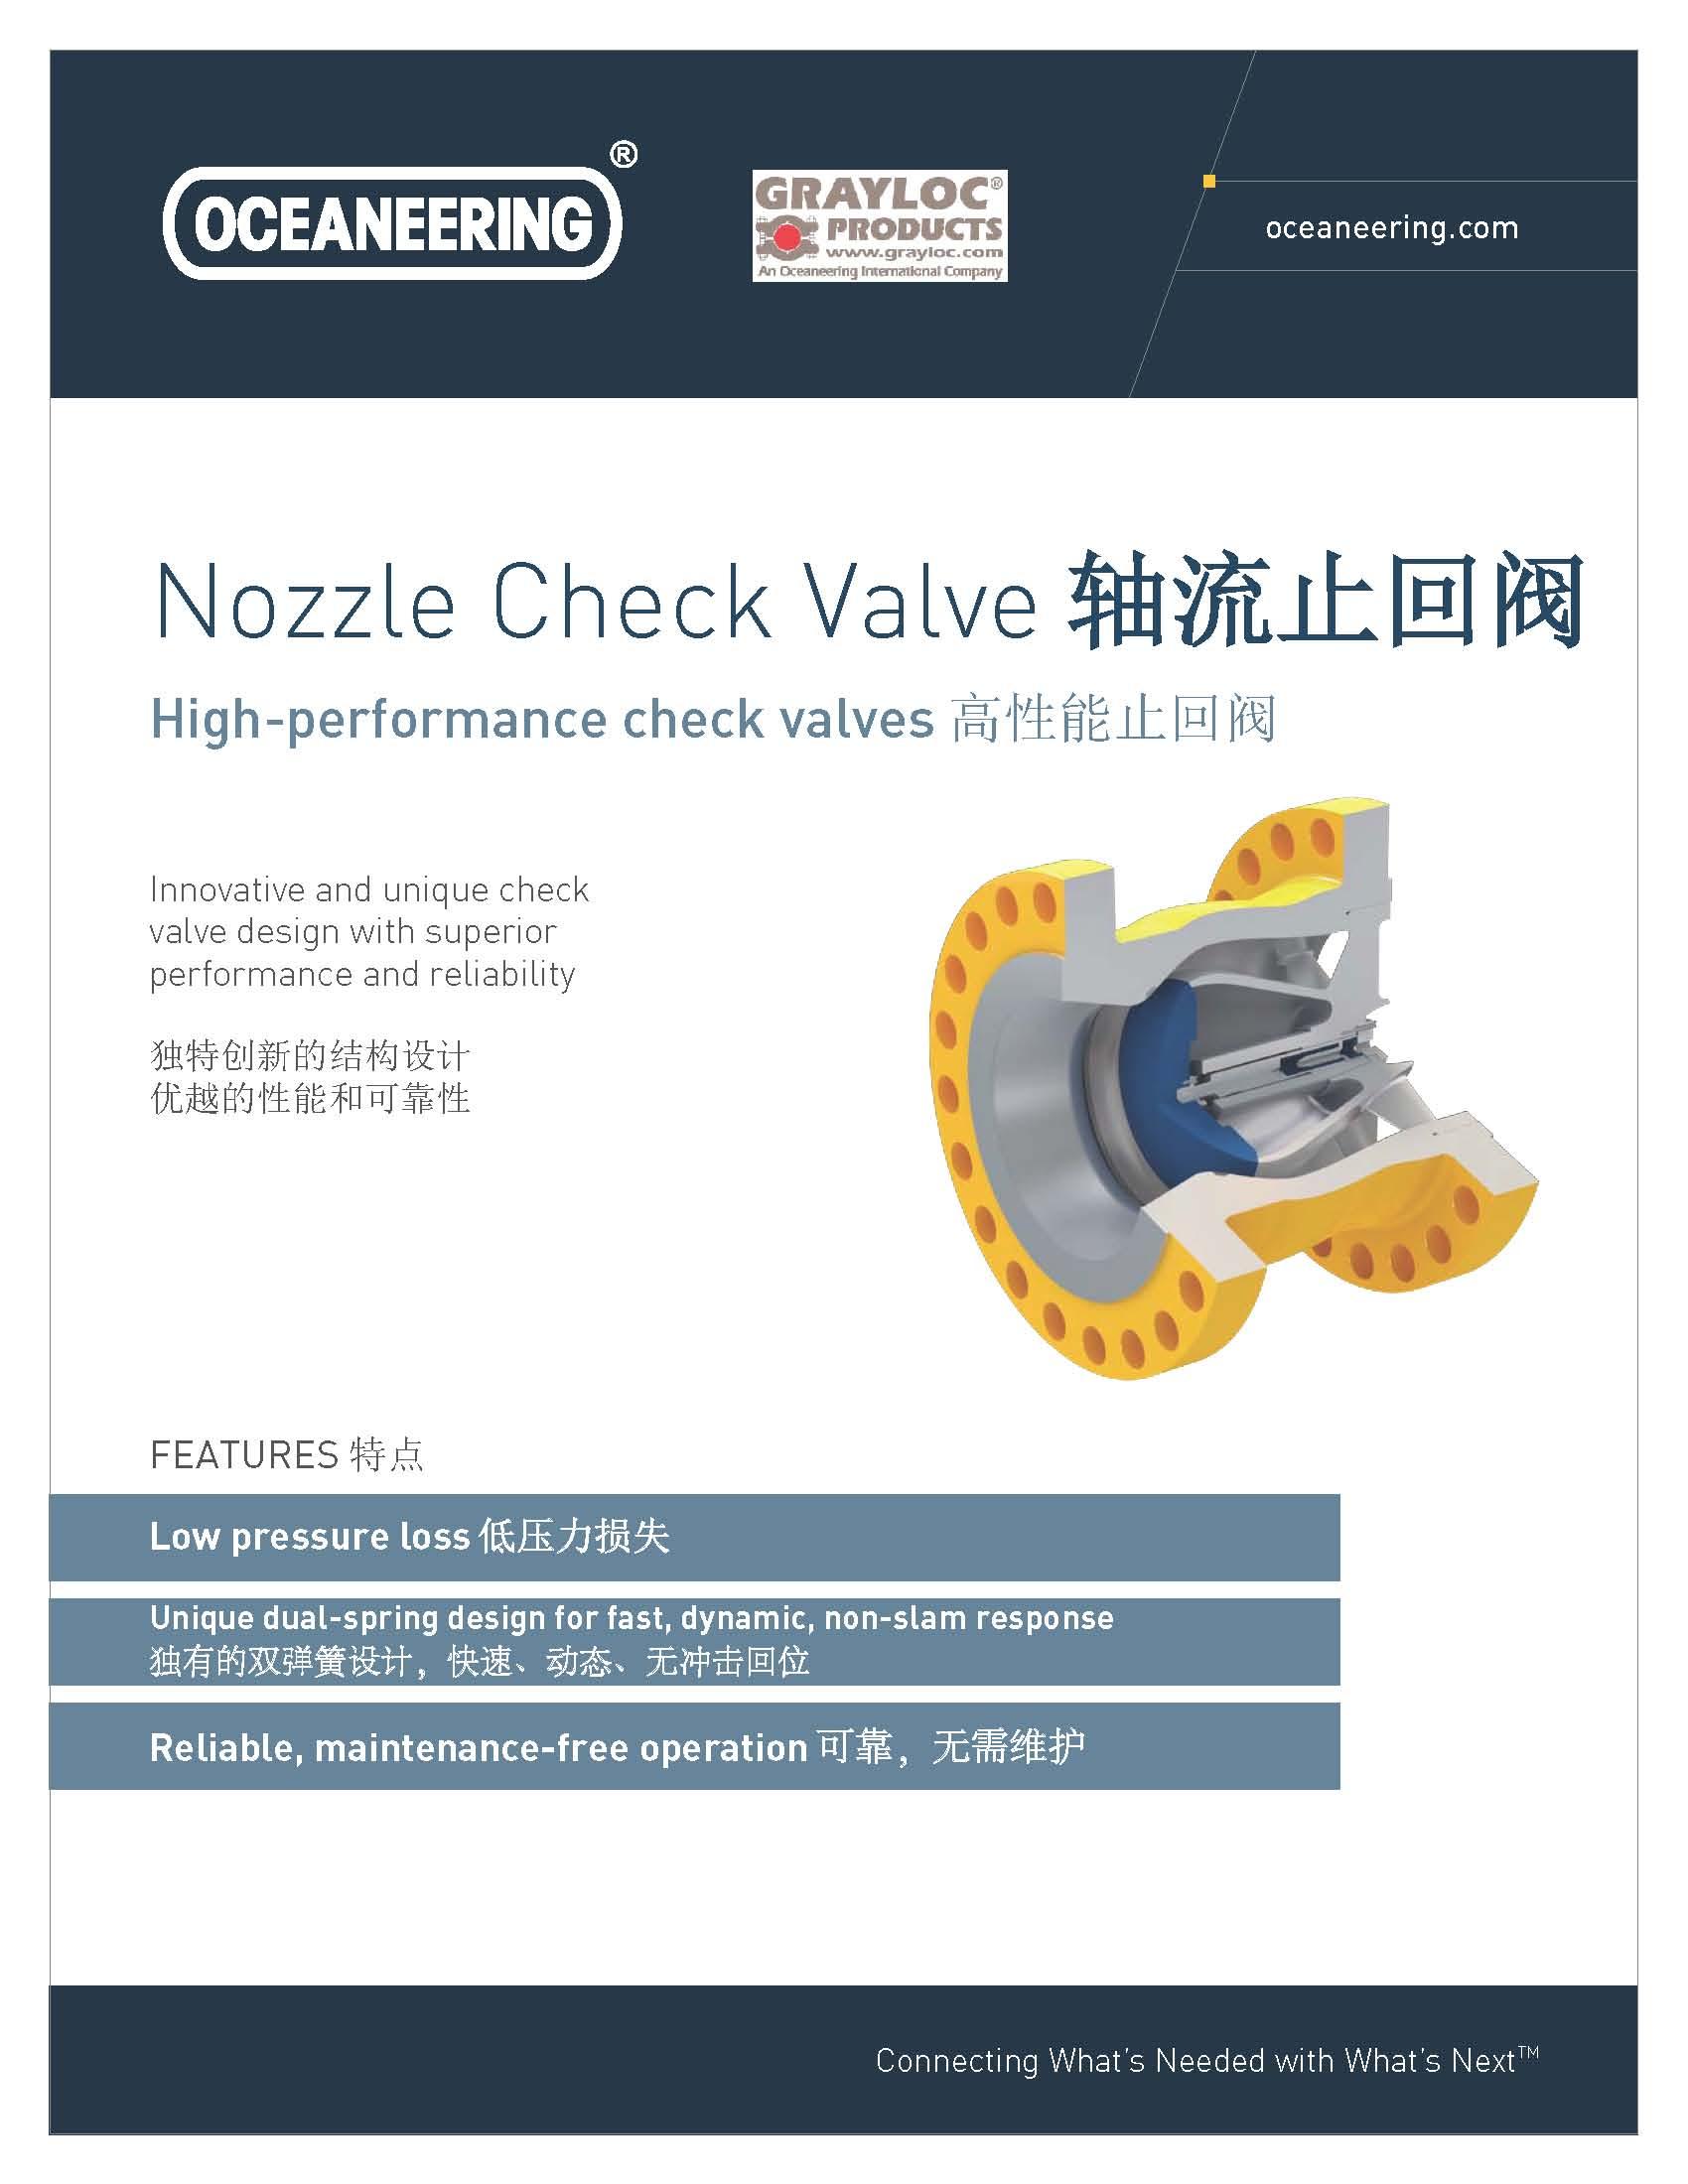 12Catalog-GraylocNozzleCheckValve-Chinese_页面_01